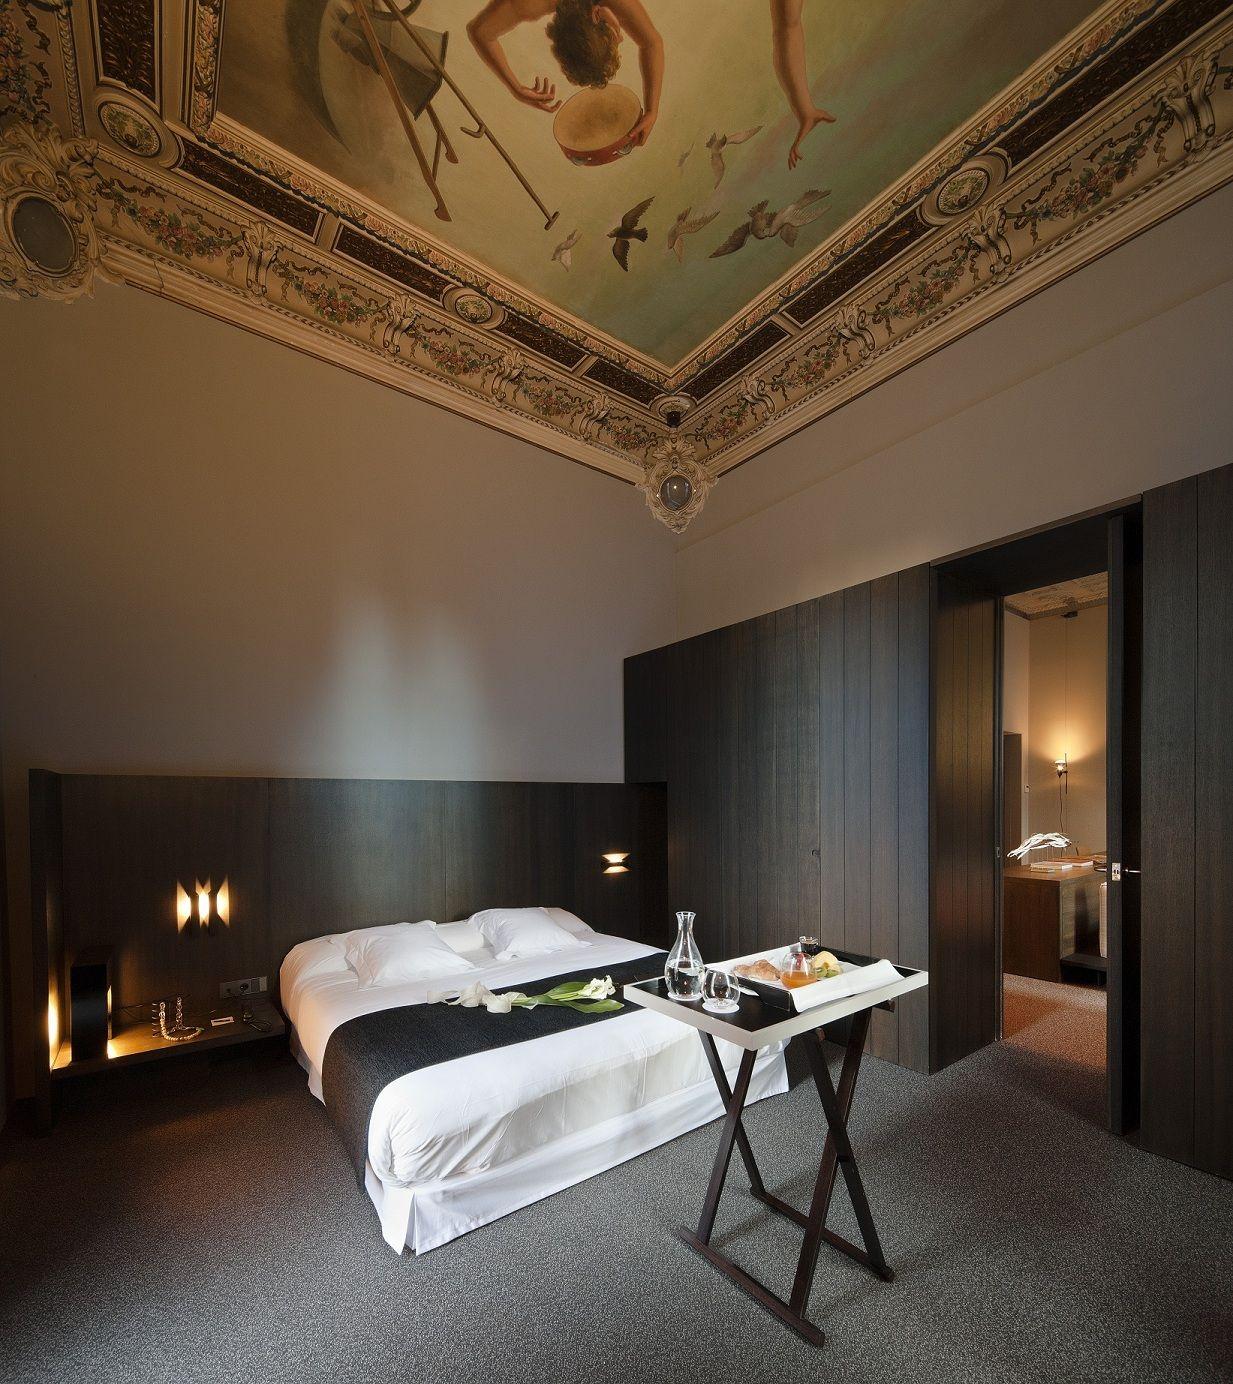 Caro hotel palacio marqu s de caro valencia spain interiores alcoba rifa y dise o de - Decoracion interiores valencia ...